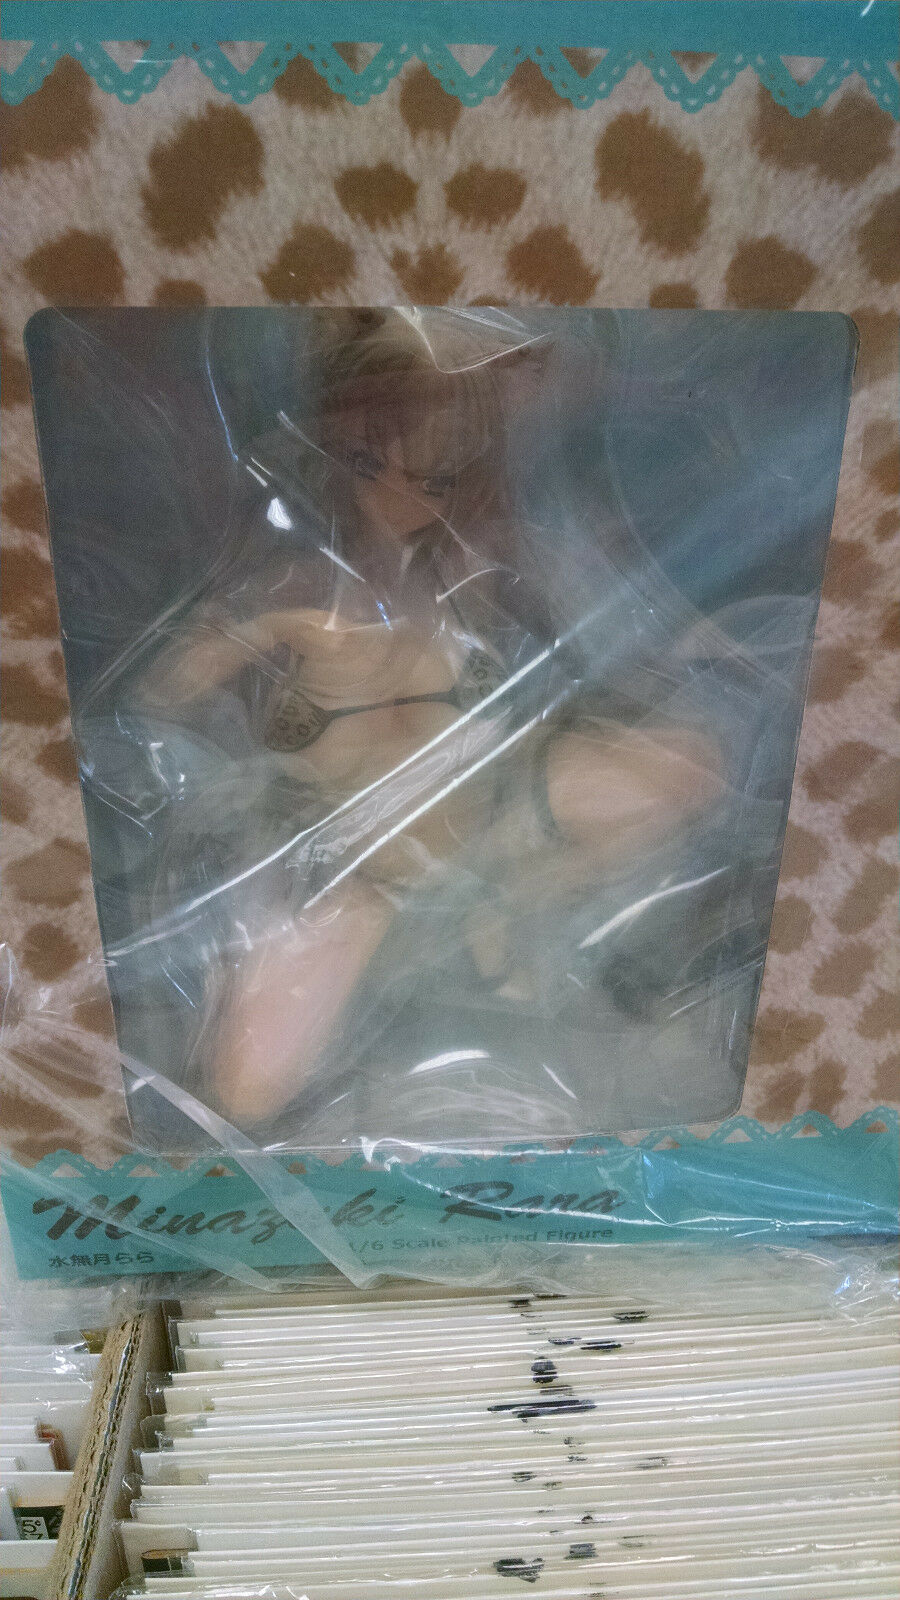 Q SIX ORIGINAL CHARACTER RARA MINAZUKI 1 6 PVC  cifra MISB AUTHENTIC JAPAN  negozio online outlet